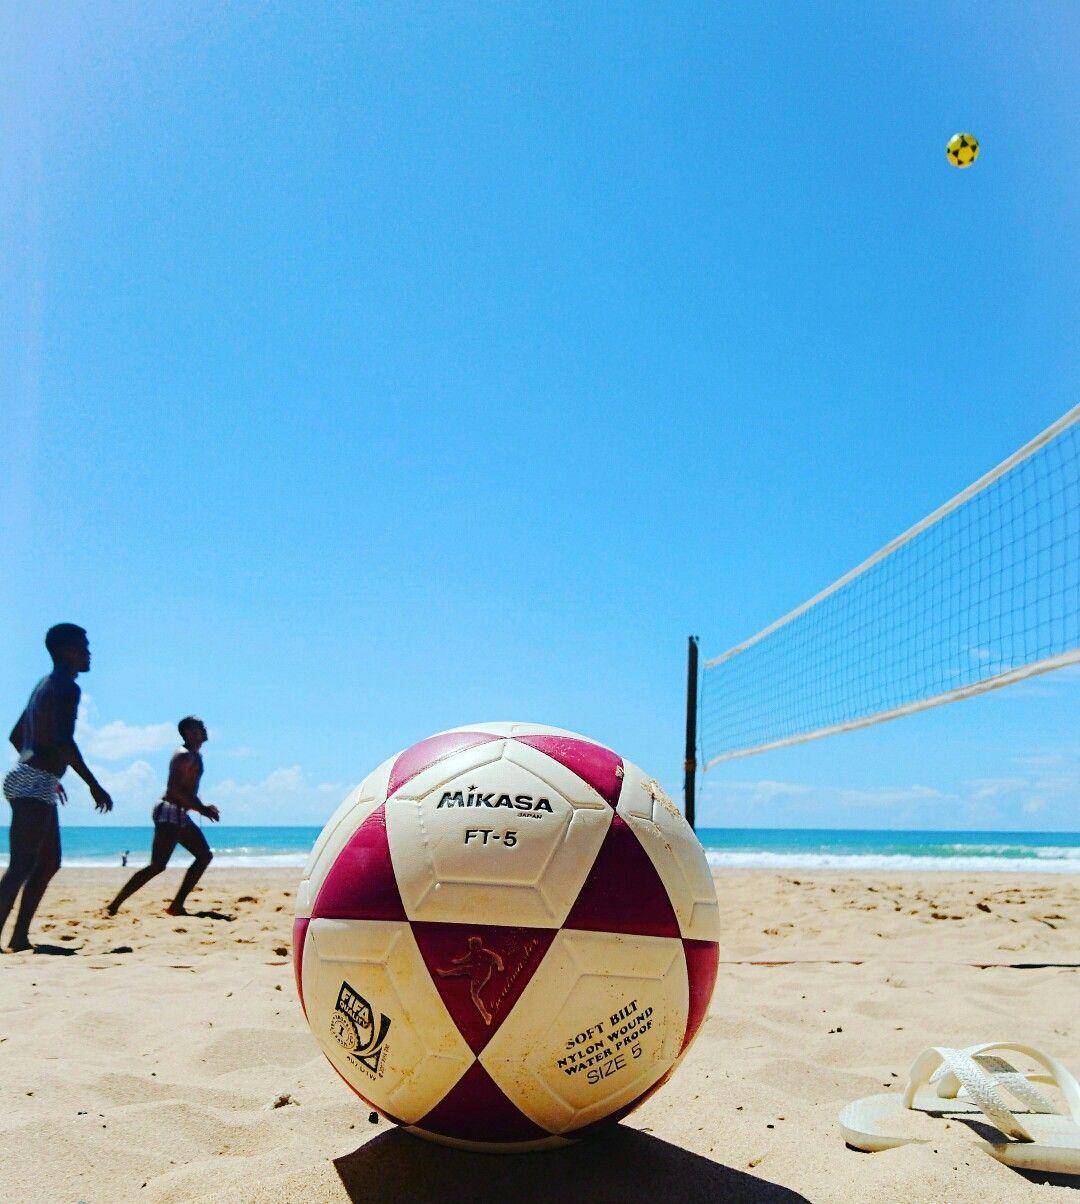 Felicidade E Aqui E Agora Beach Summer Sea Sun Ocean Sand Sunset Love Vemcomigo Vemprotreino Futevolei Footvo Instagram Photo Scenic Views